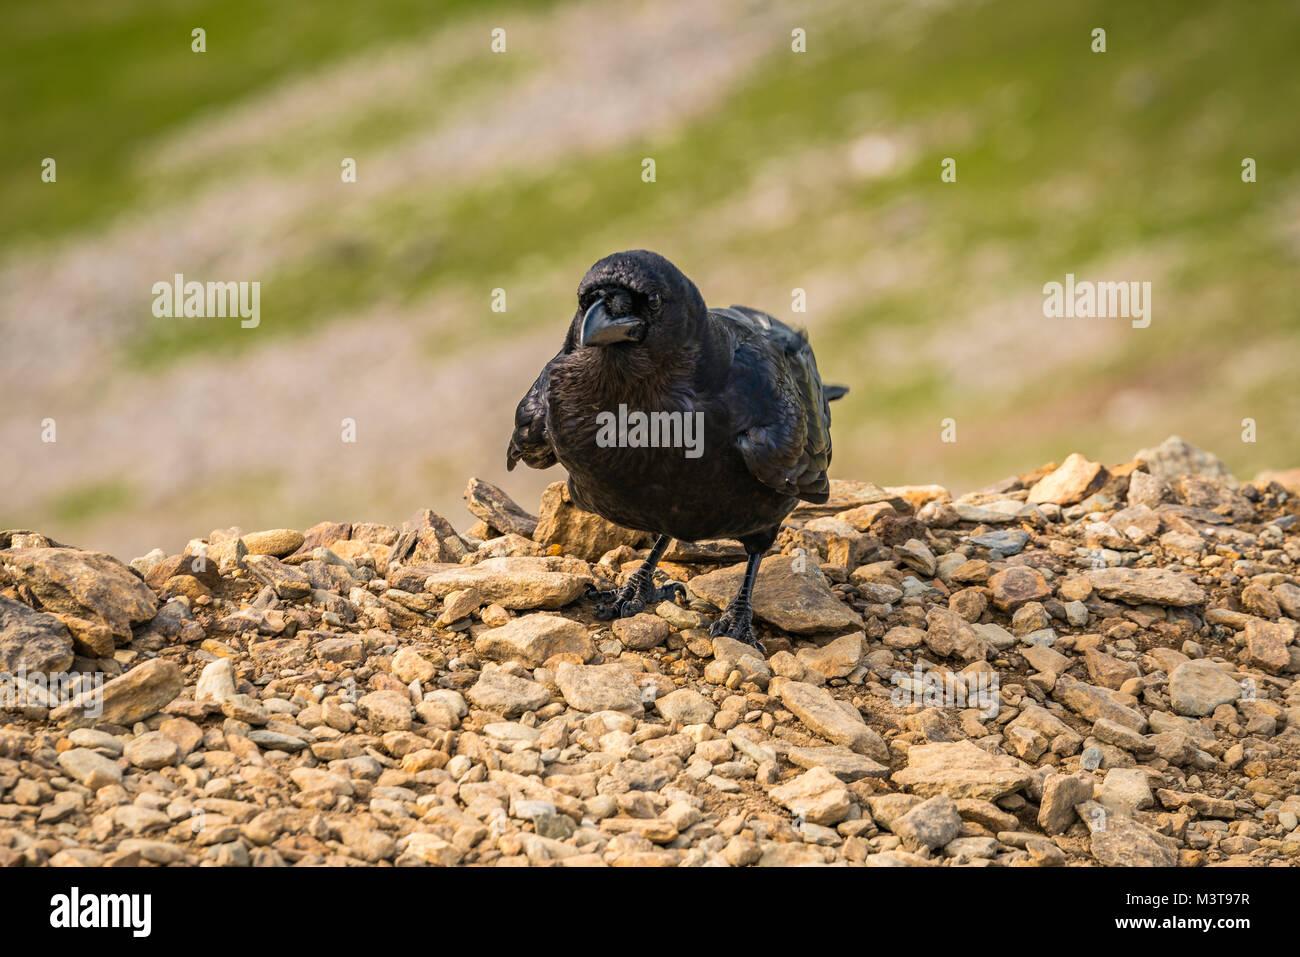 A black raven on the Llanberis Path, Snowdonia, Gwynedd, Wales, UK - Stock Image